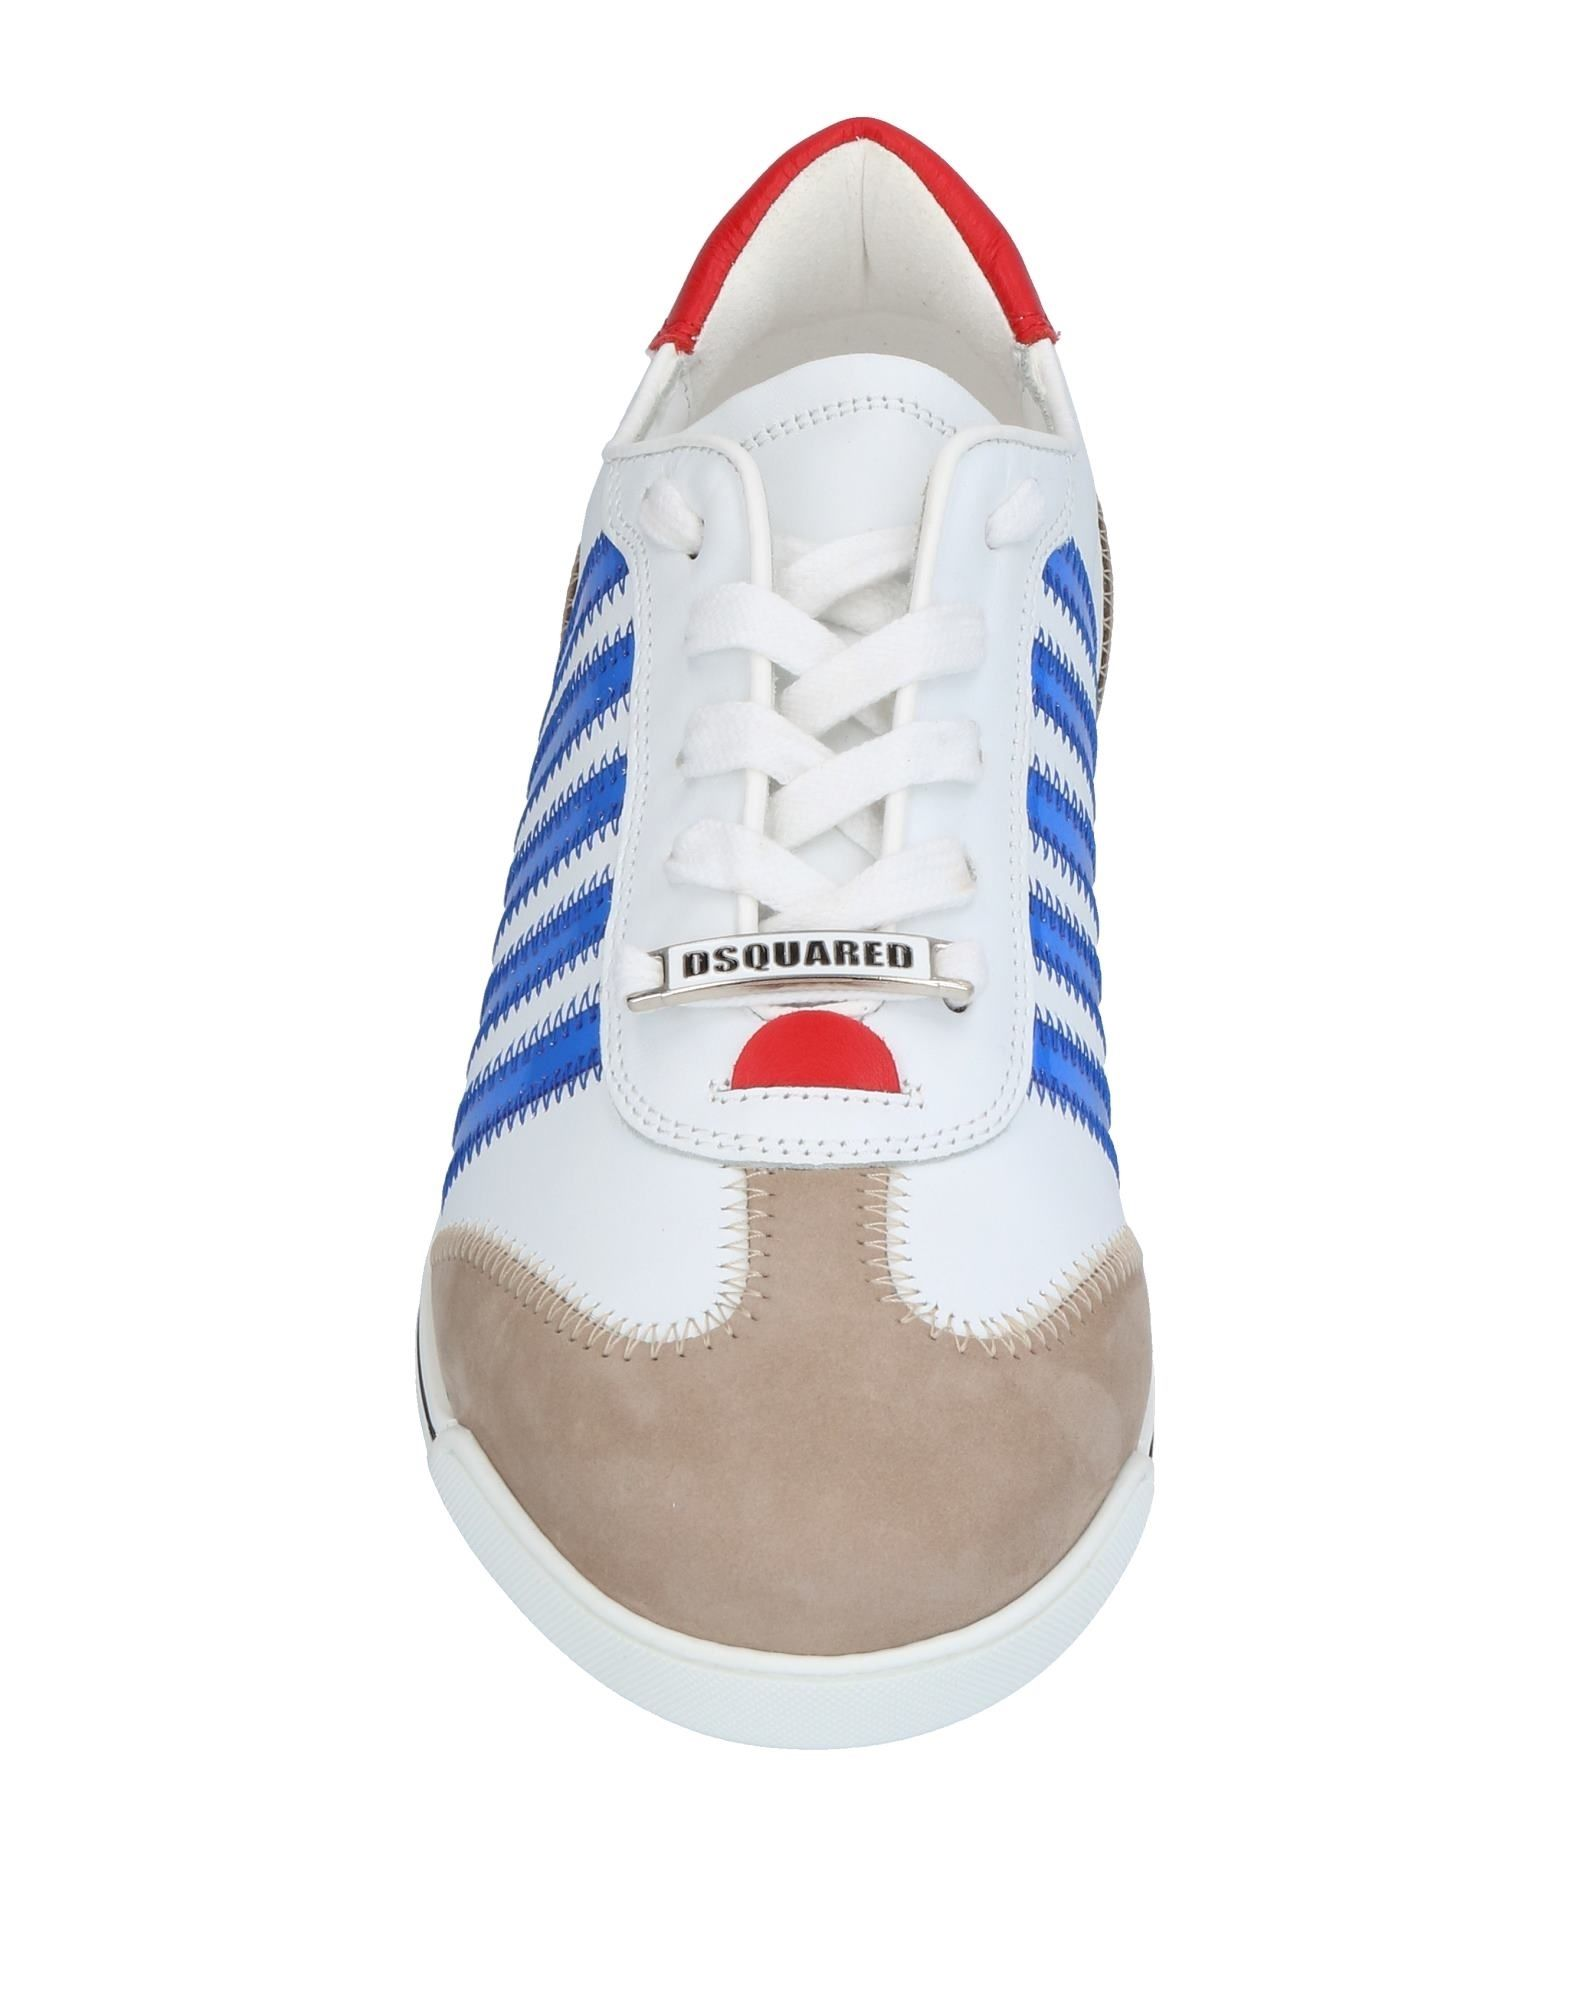 Dsquared2 Sneakers Herren  11378044VQ Gute Qualität beliebte Schuhe